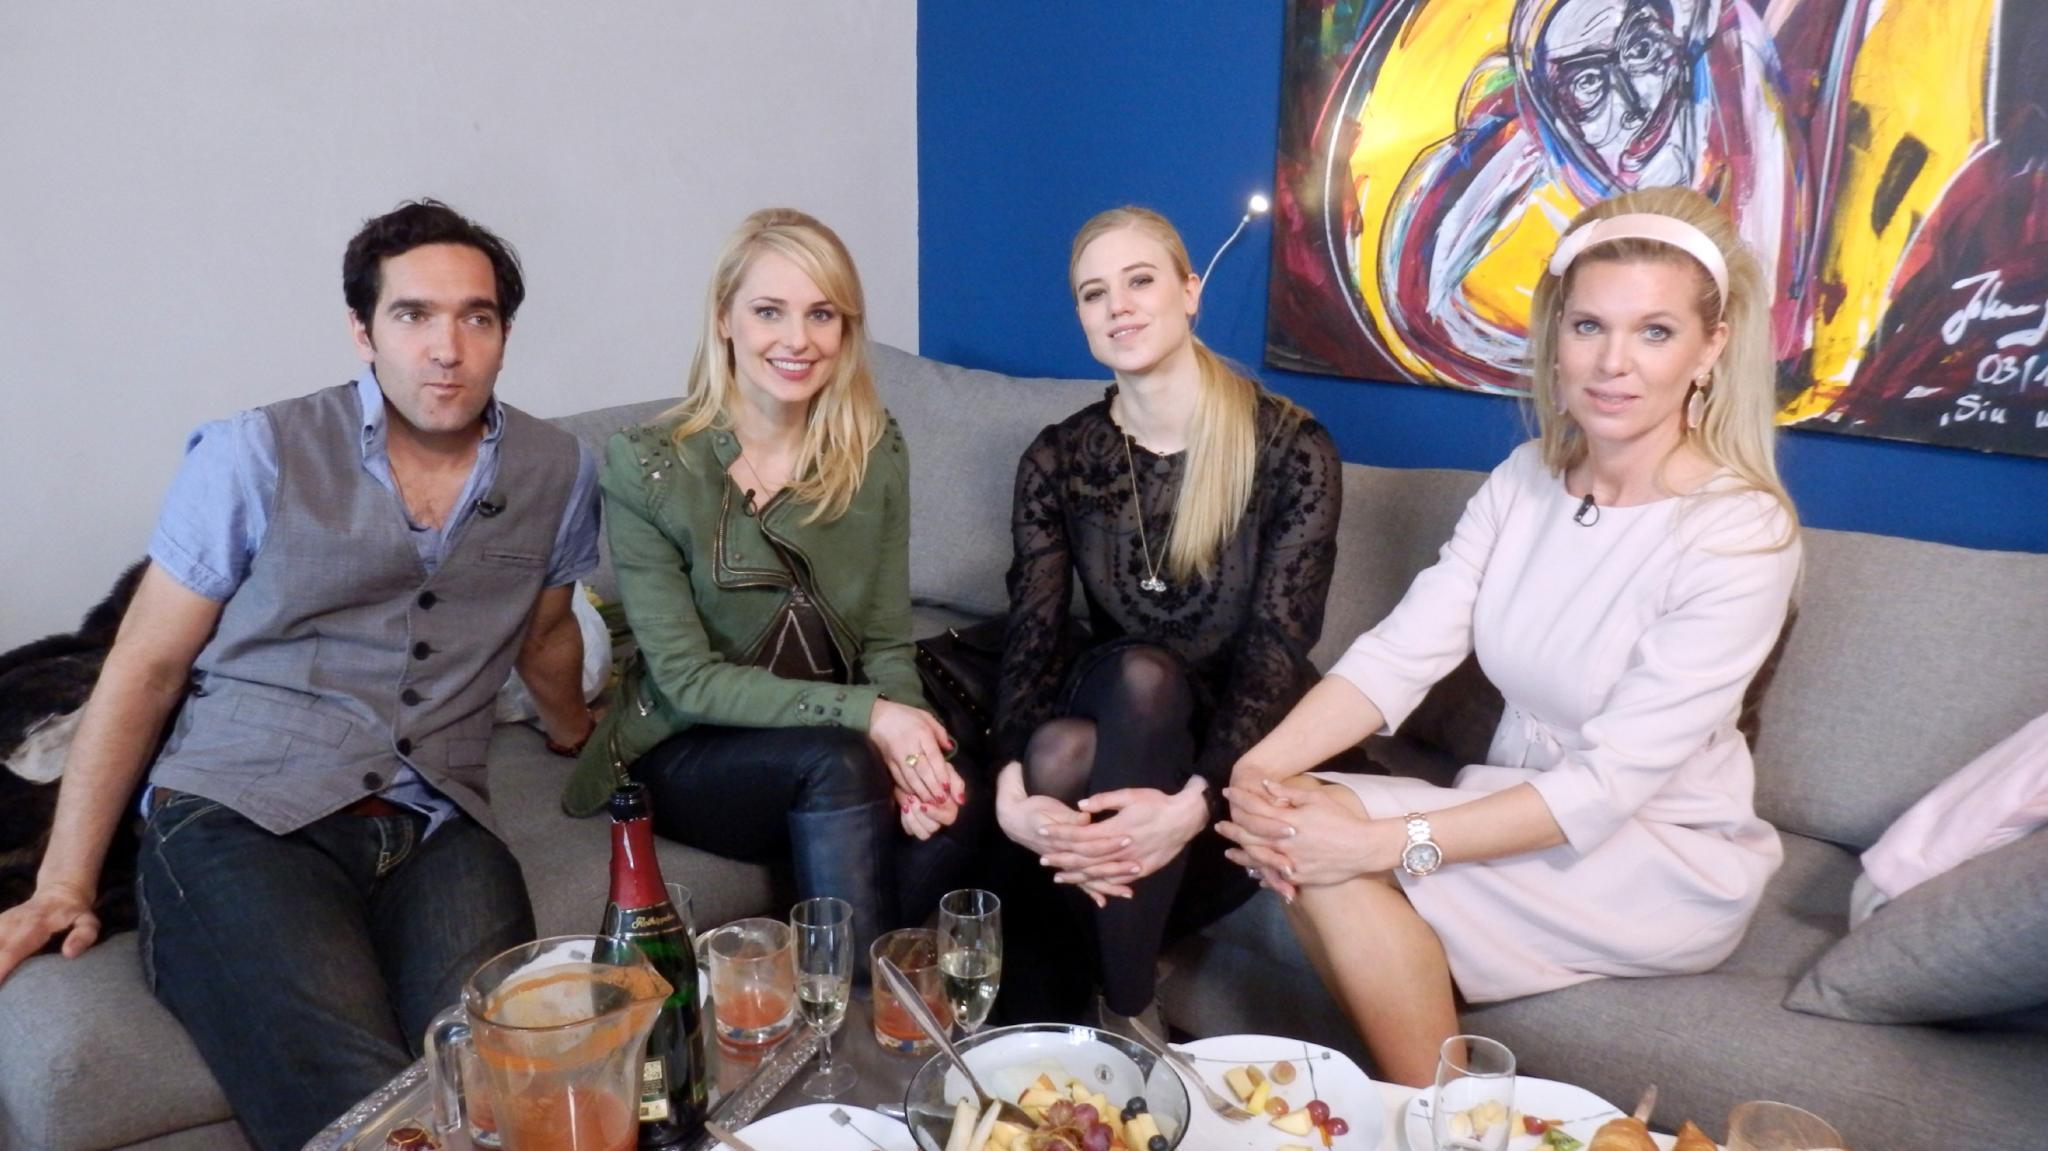 Thomas Maximilian Held, Larissa Marolt, Silvia Schneider, Prinzessin Maja von Hohenzollern